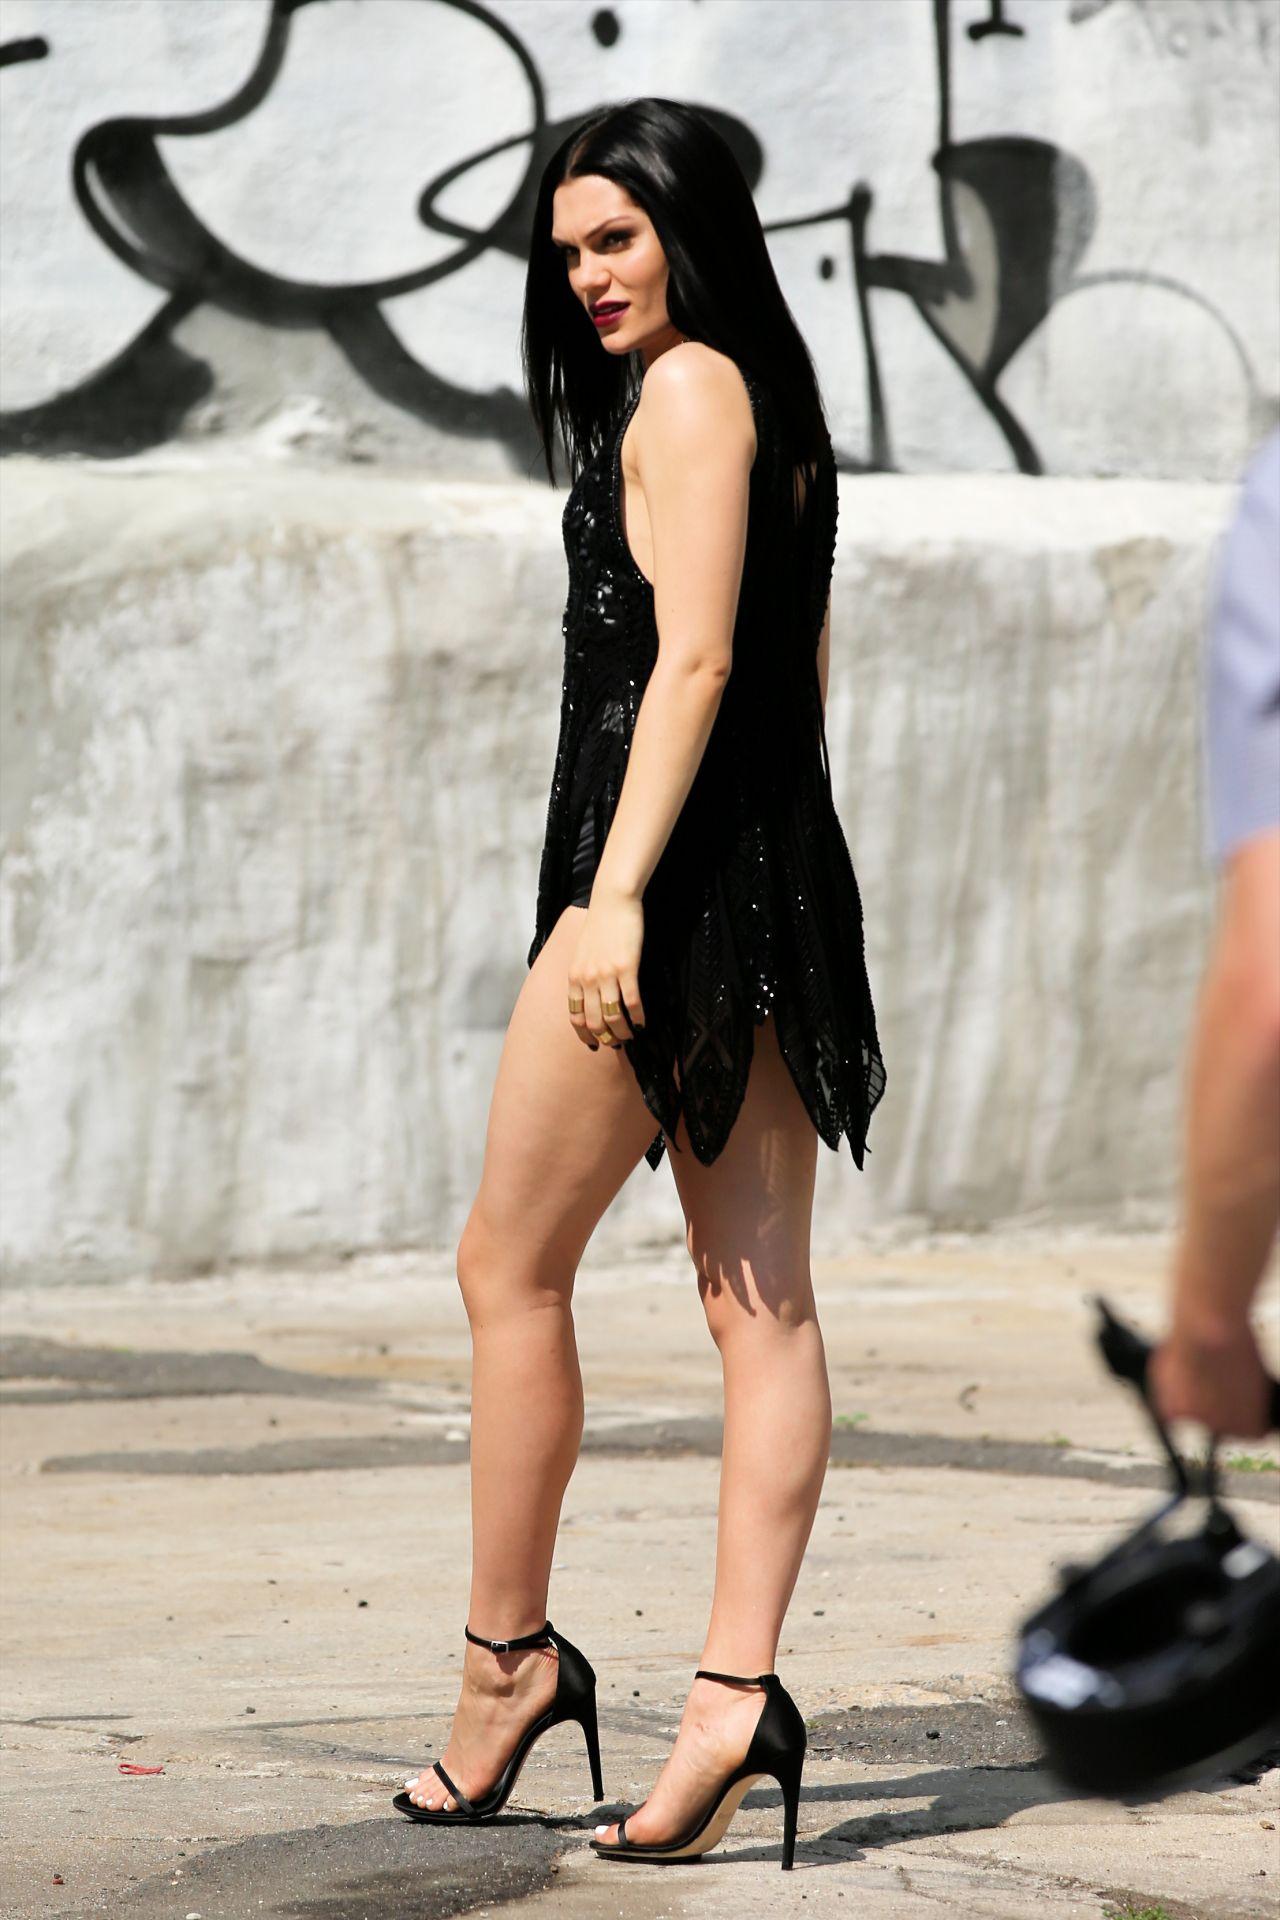 Jessie J - Photoshoot In New York City